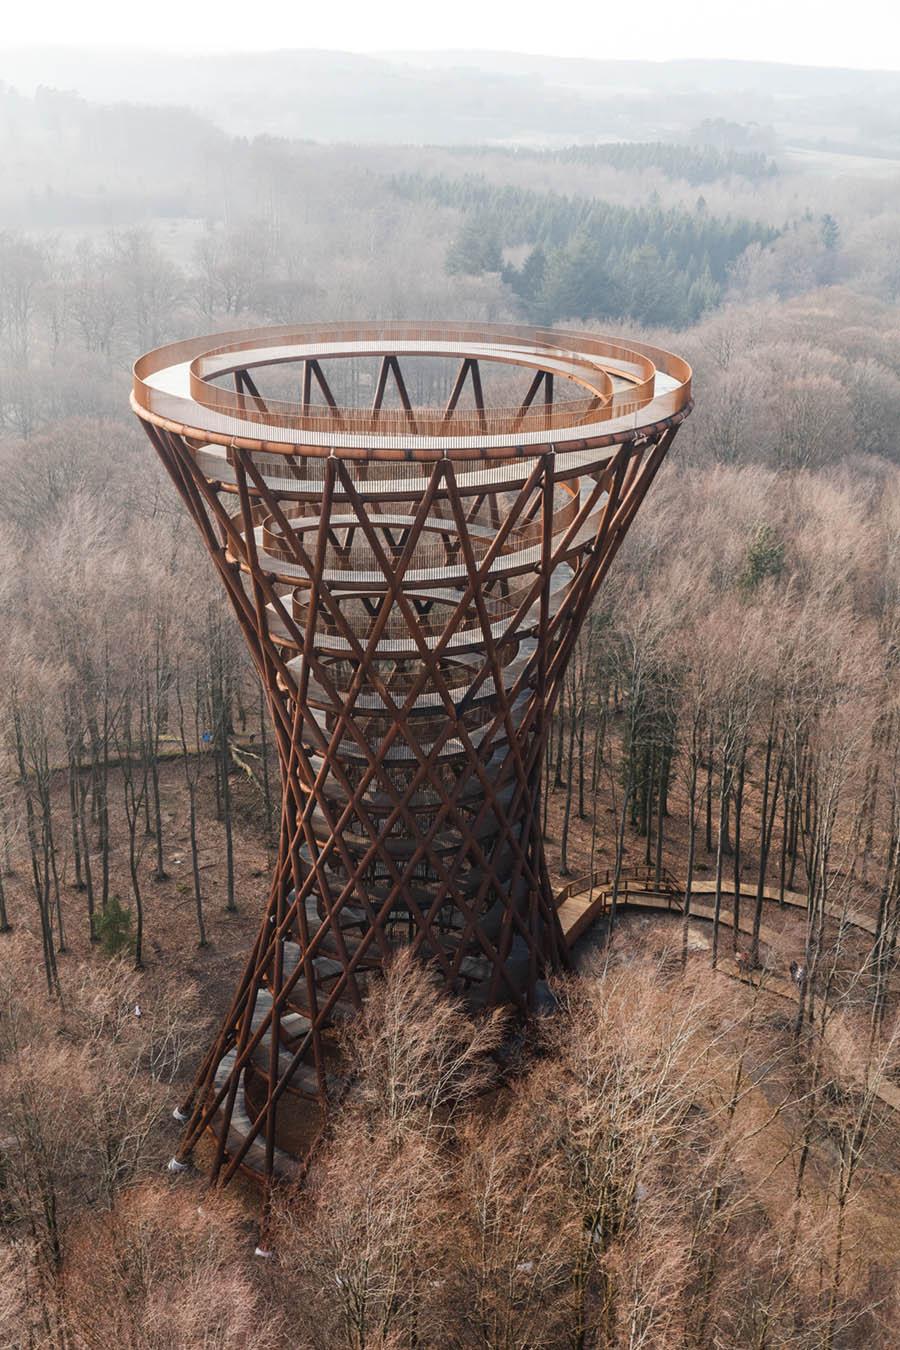 Camp Adventure Observation Tower by EFFEKT